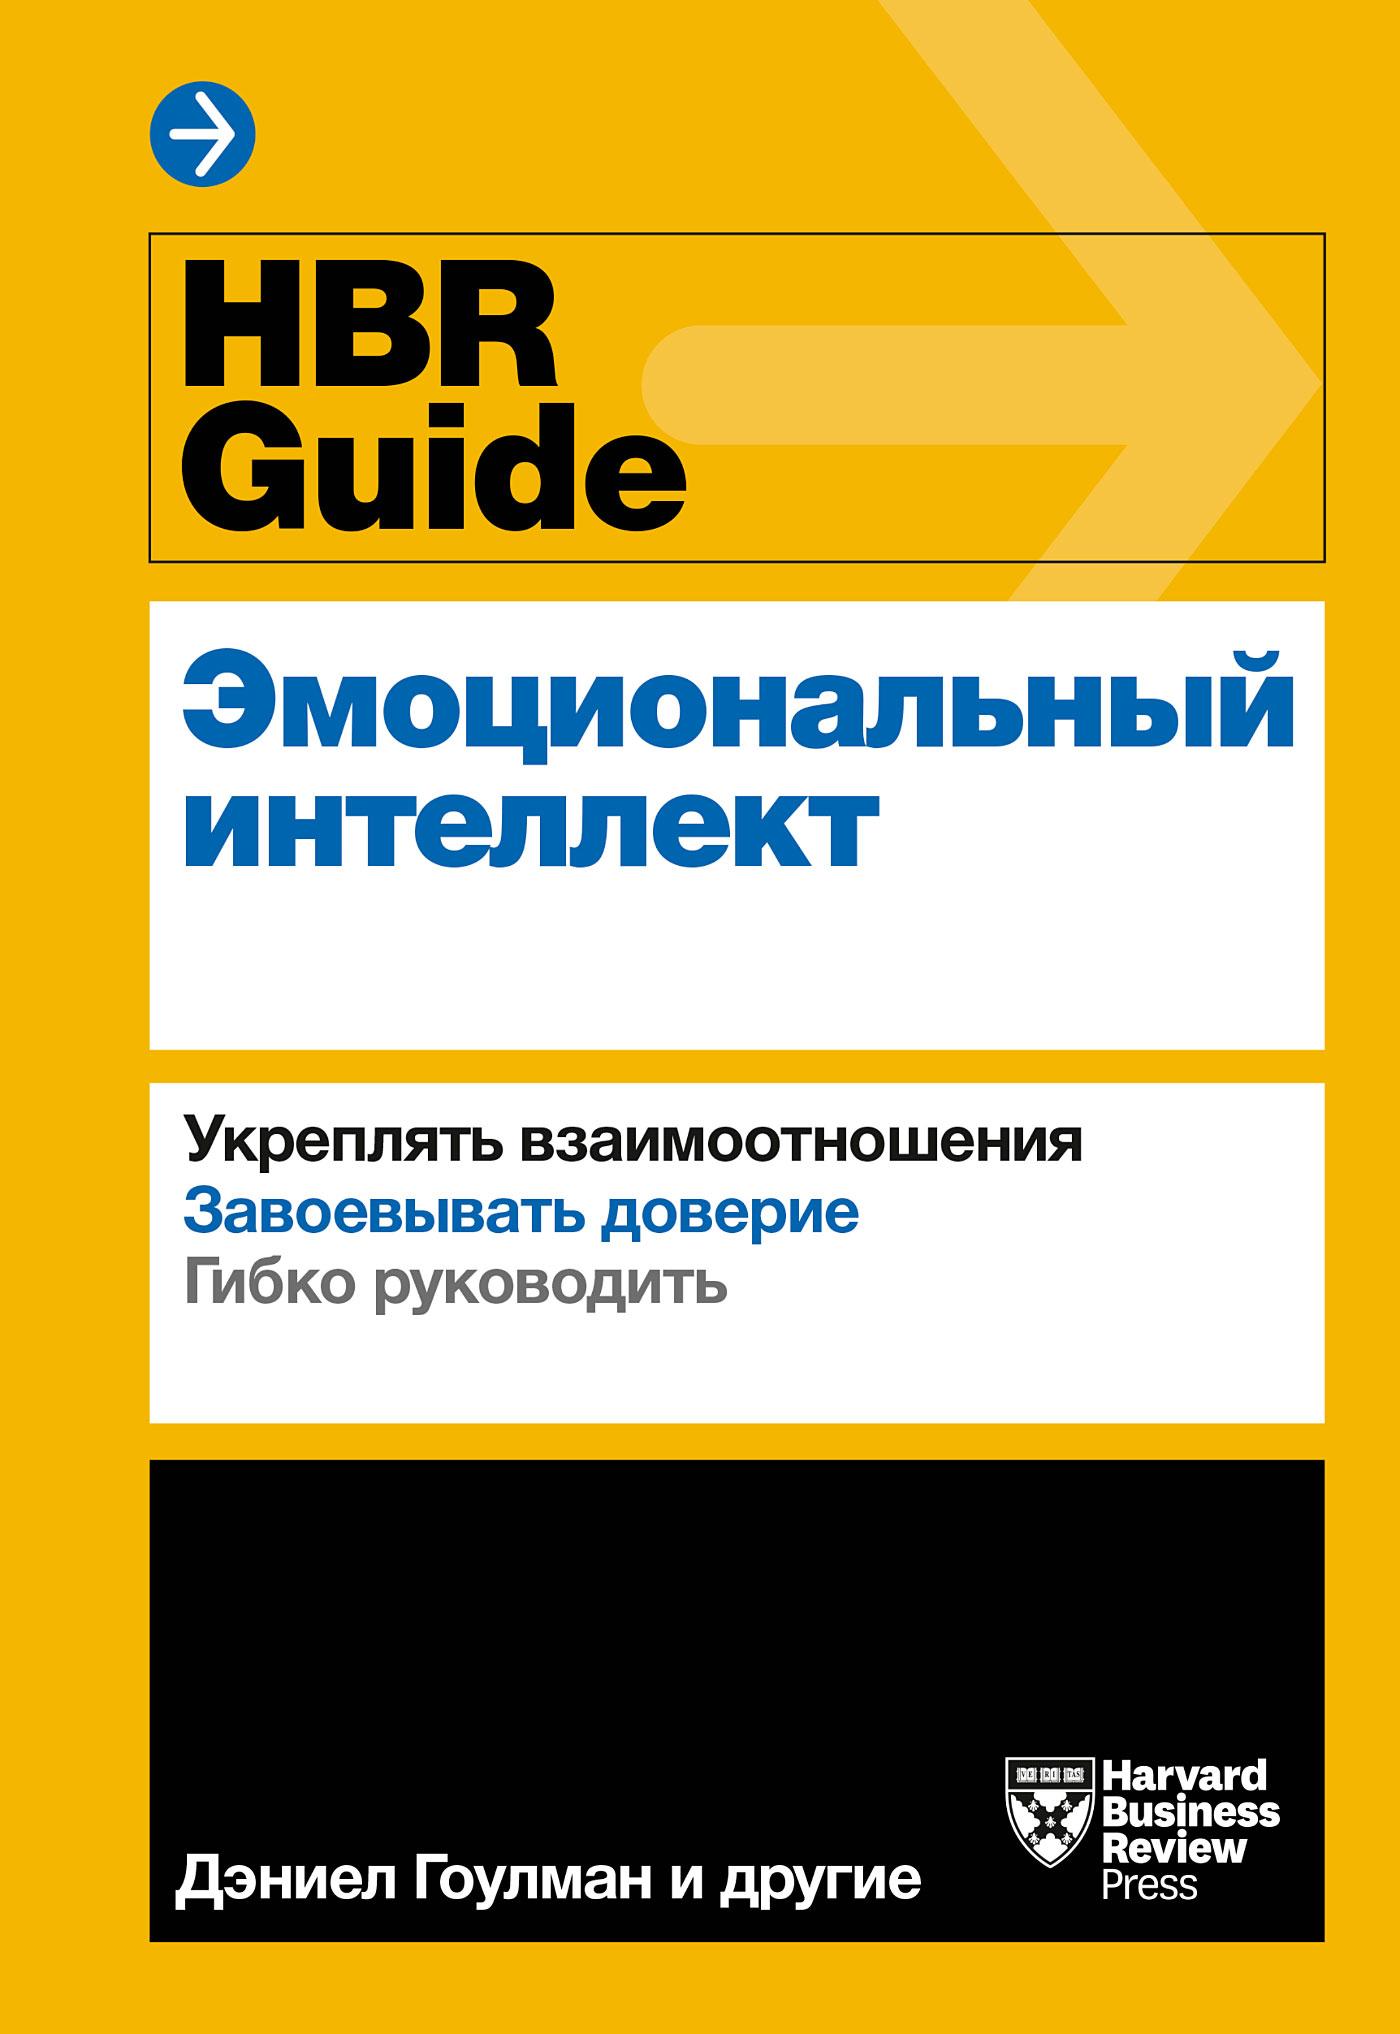 Обложка книги. Автор -  Harvard Business Review Guides